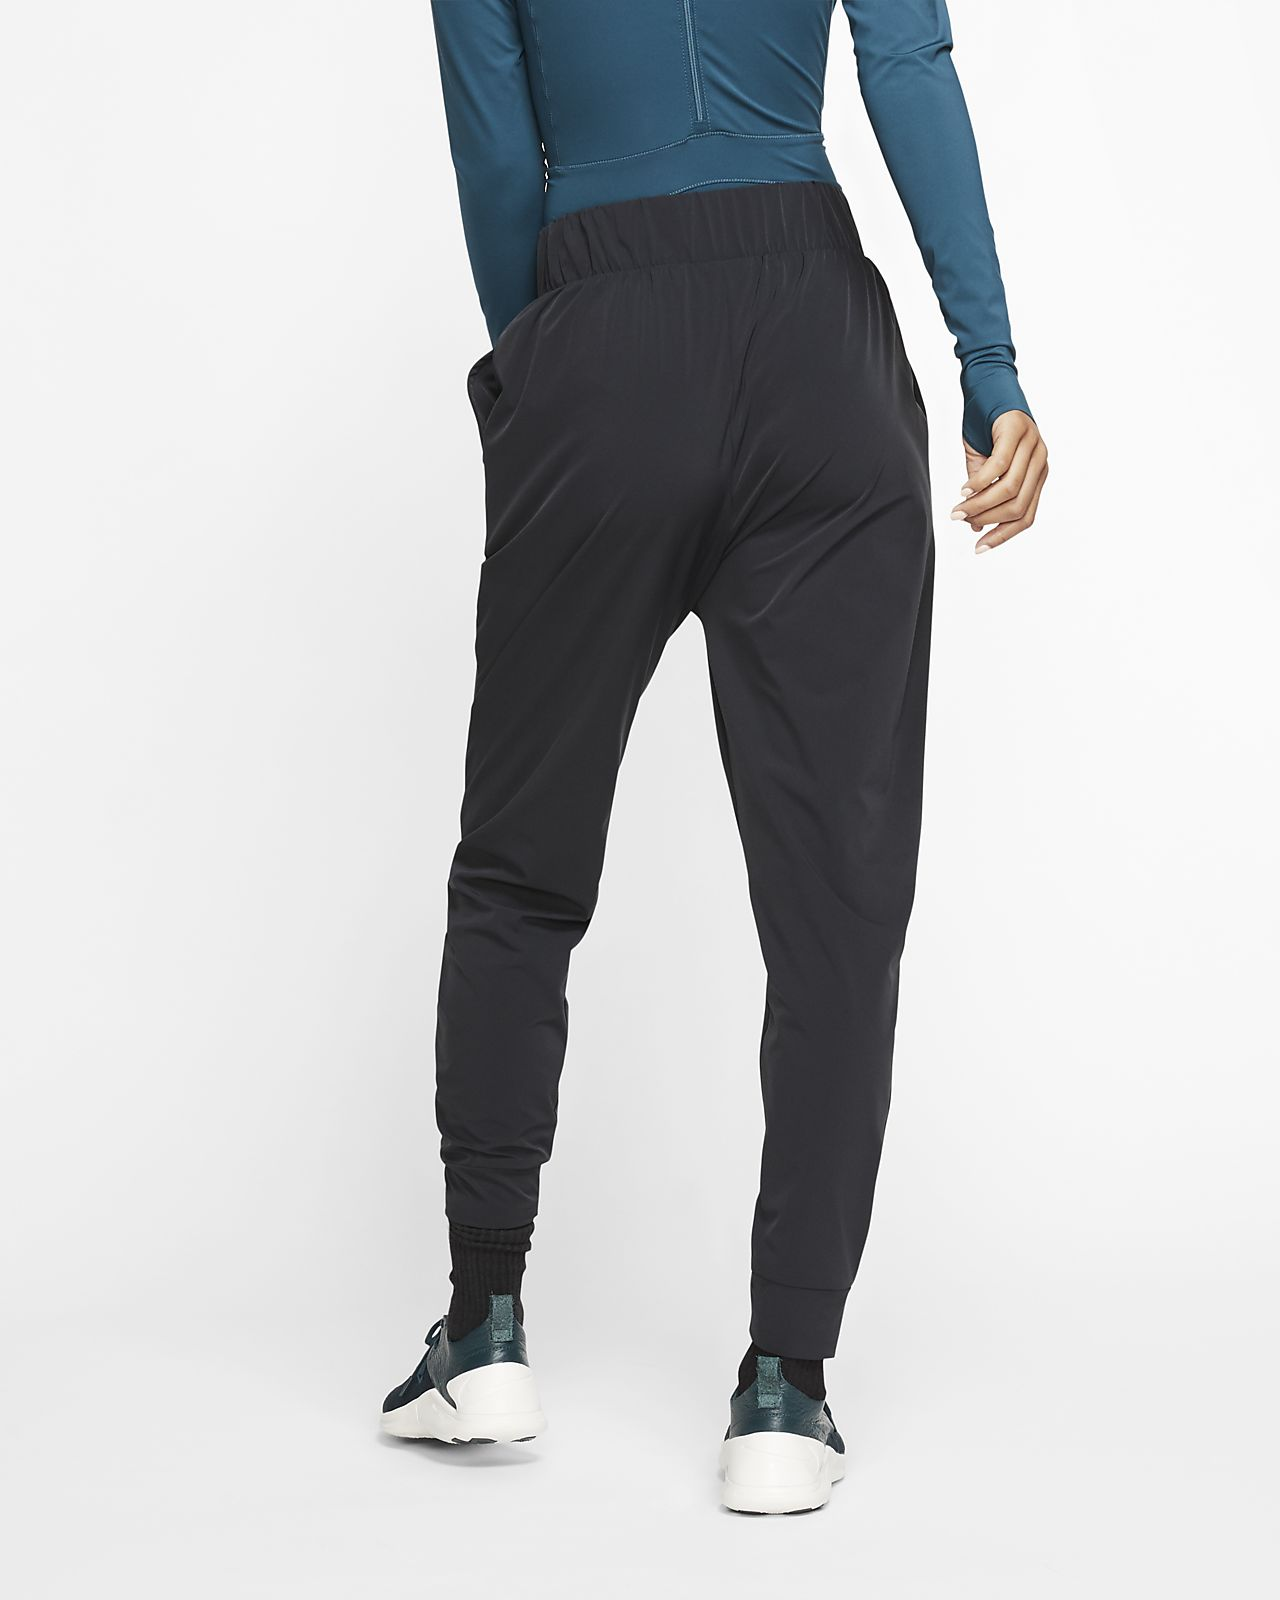 Women's Nike Pants | Kohl's